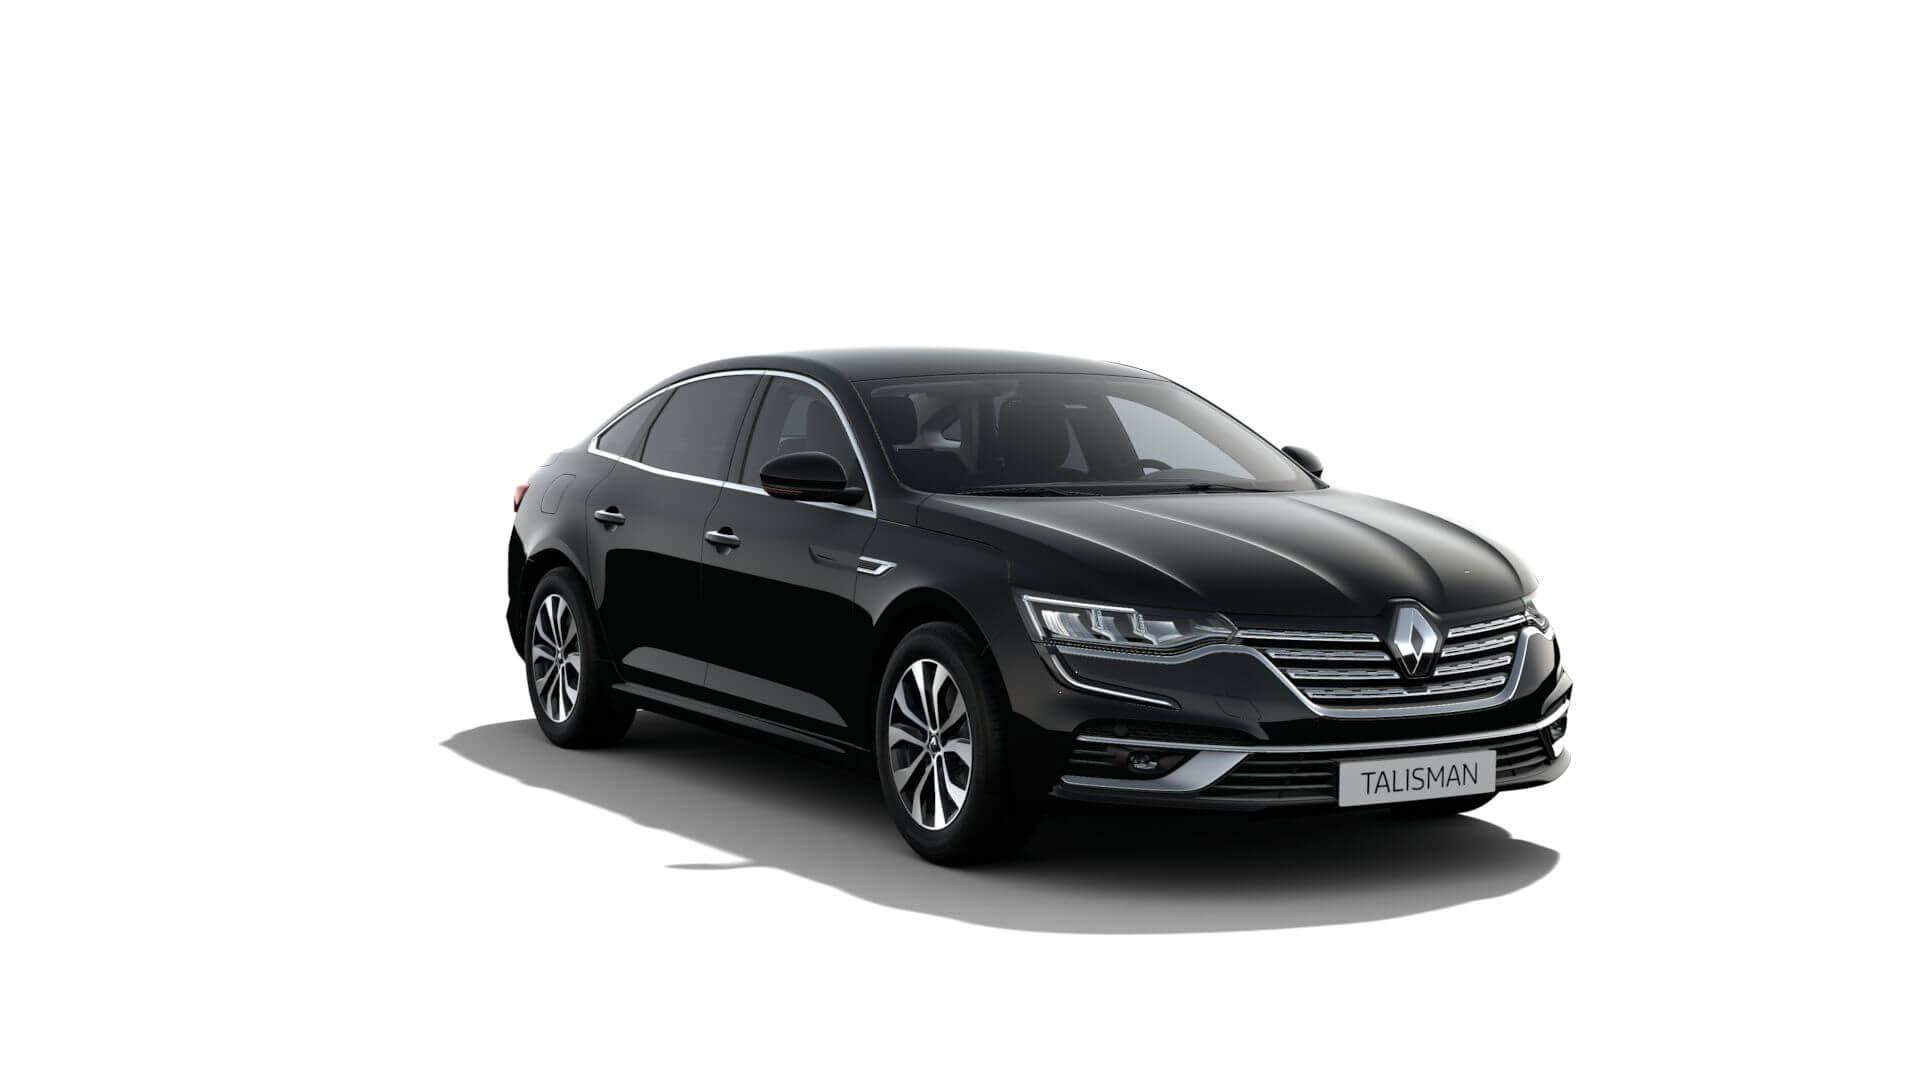 Automodell schwarz - Renault Talisman - Renault Ahrens Hannover